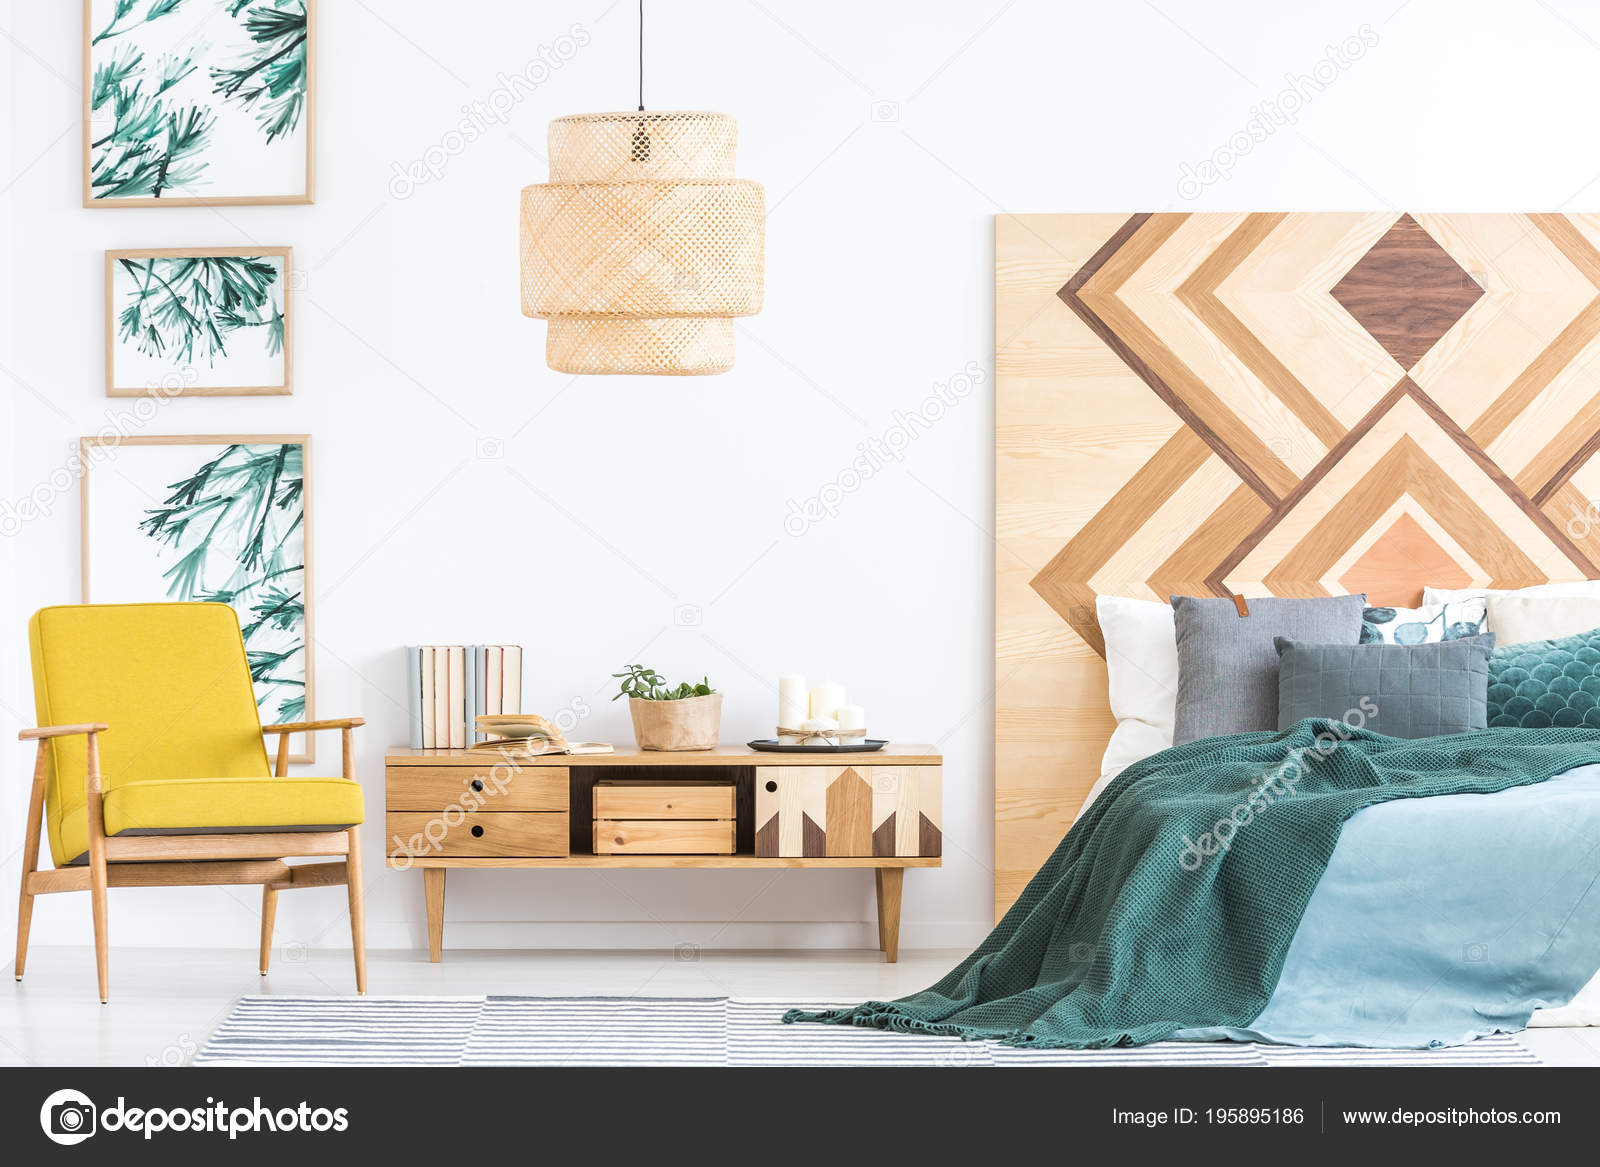 Houten Slaapkamer Kast : Houten kast tussen gele fauteuil groene bed slaapkamer interieur met